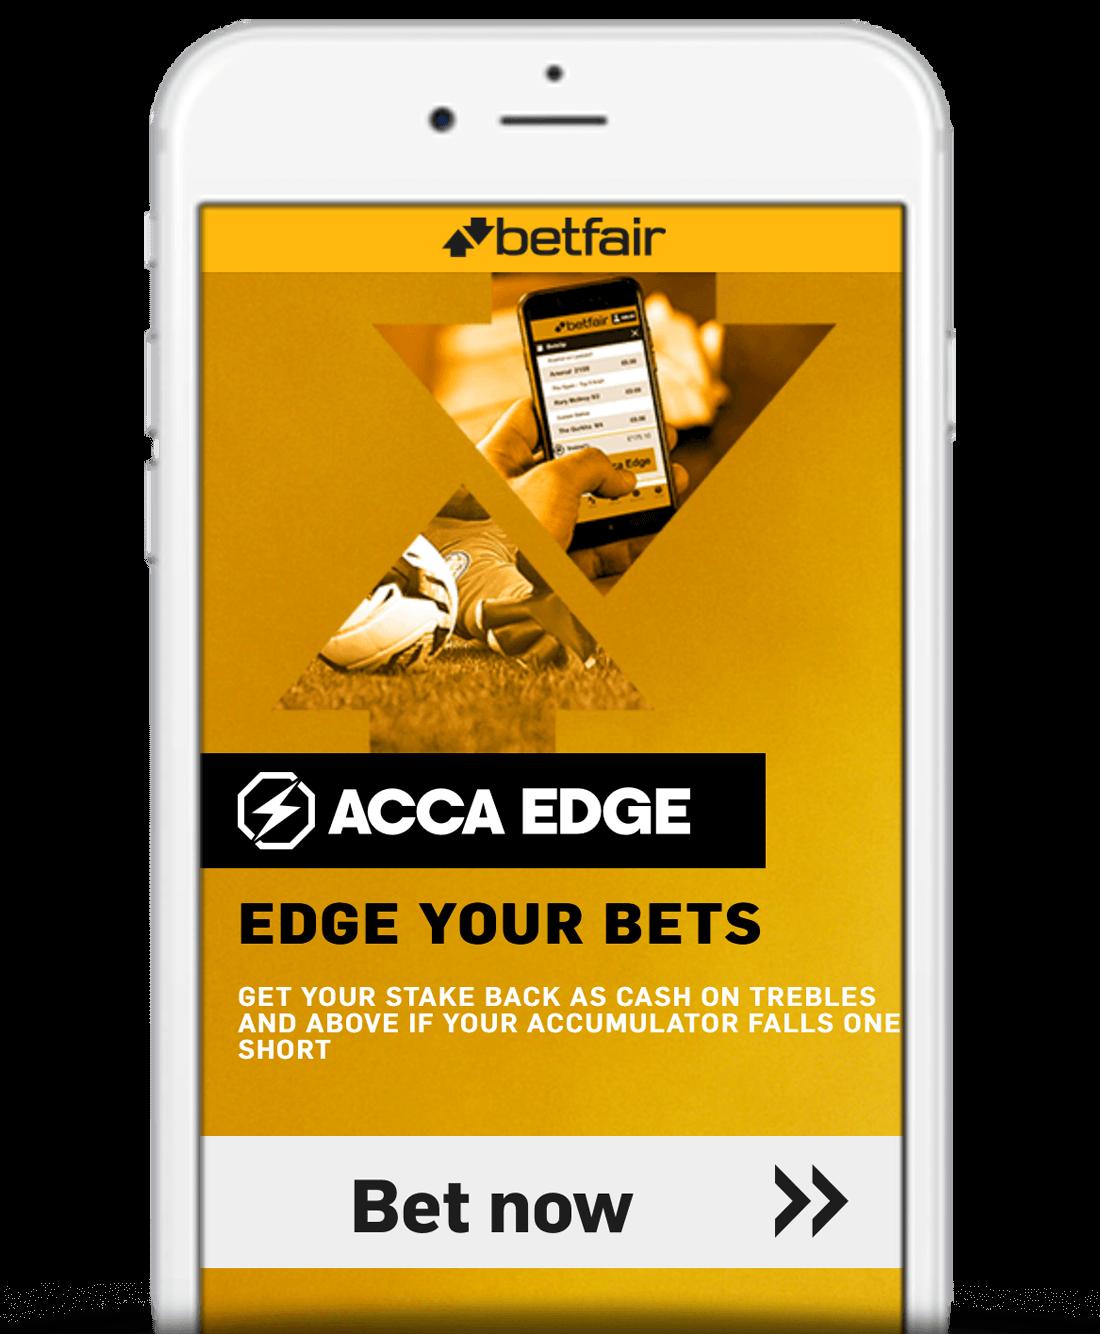 What Is Betfair Acca Edge?